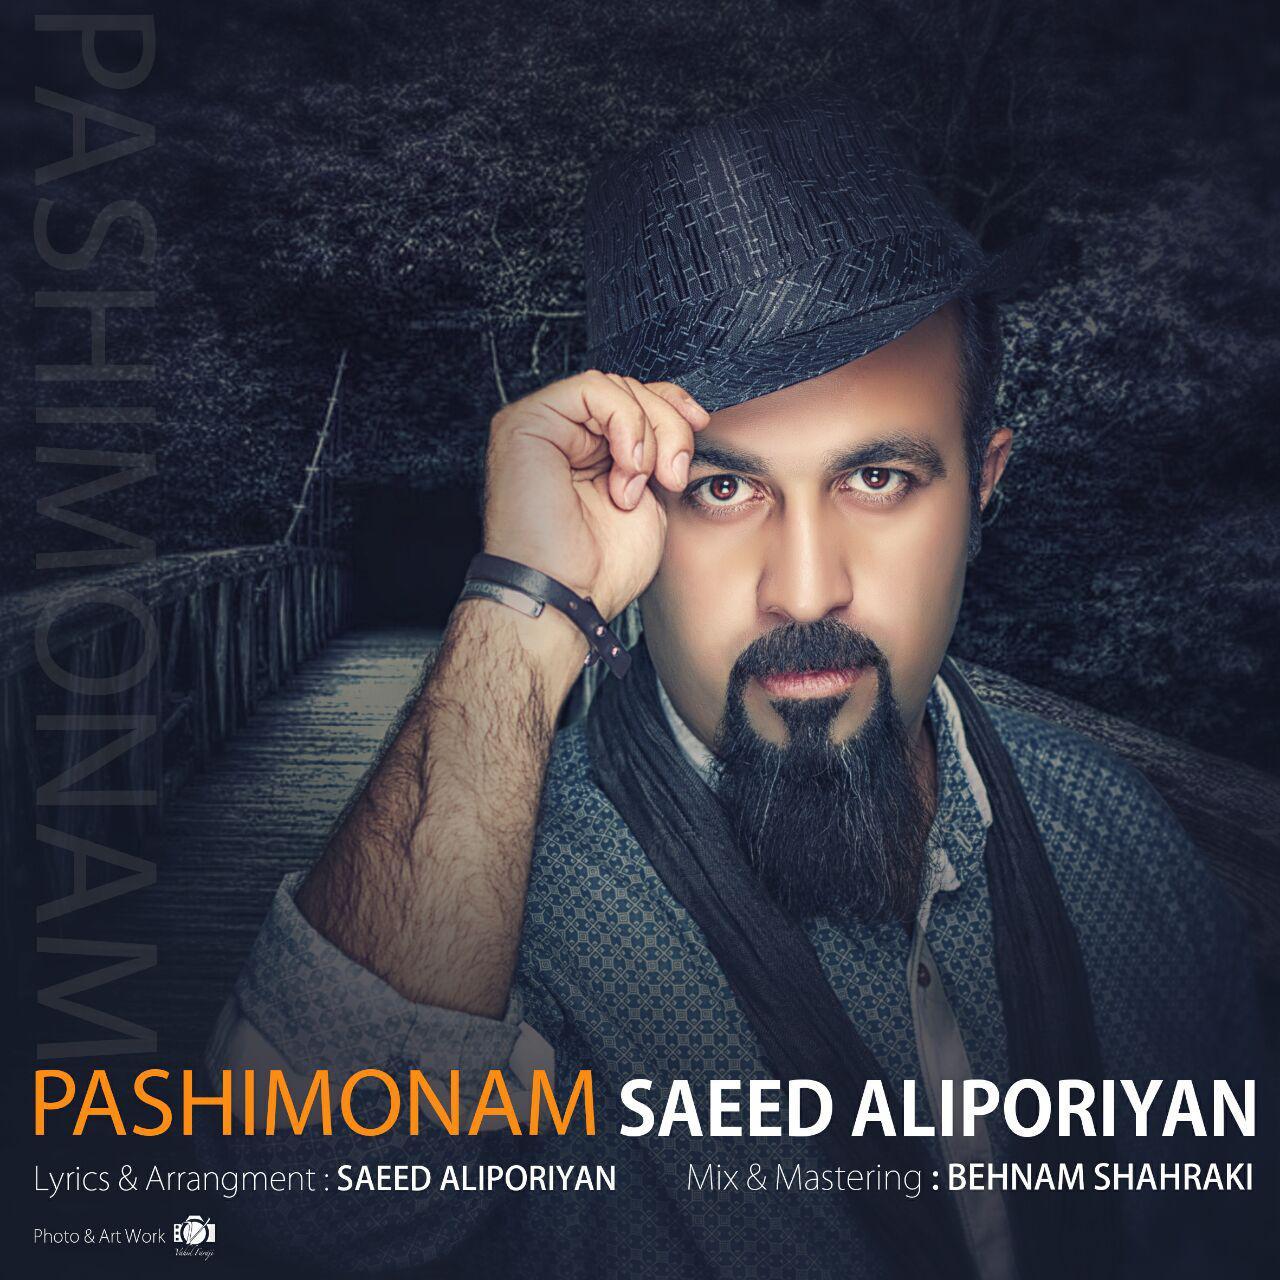 دانلود آهنگ جدید سعید علیپوریان بنام پشیمونم